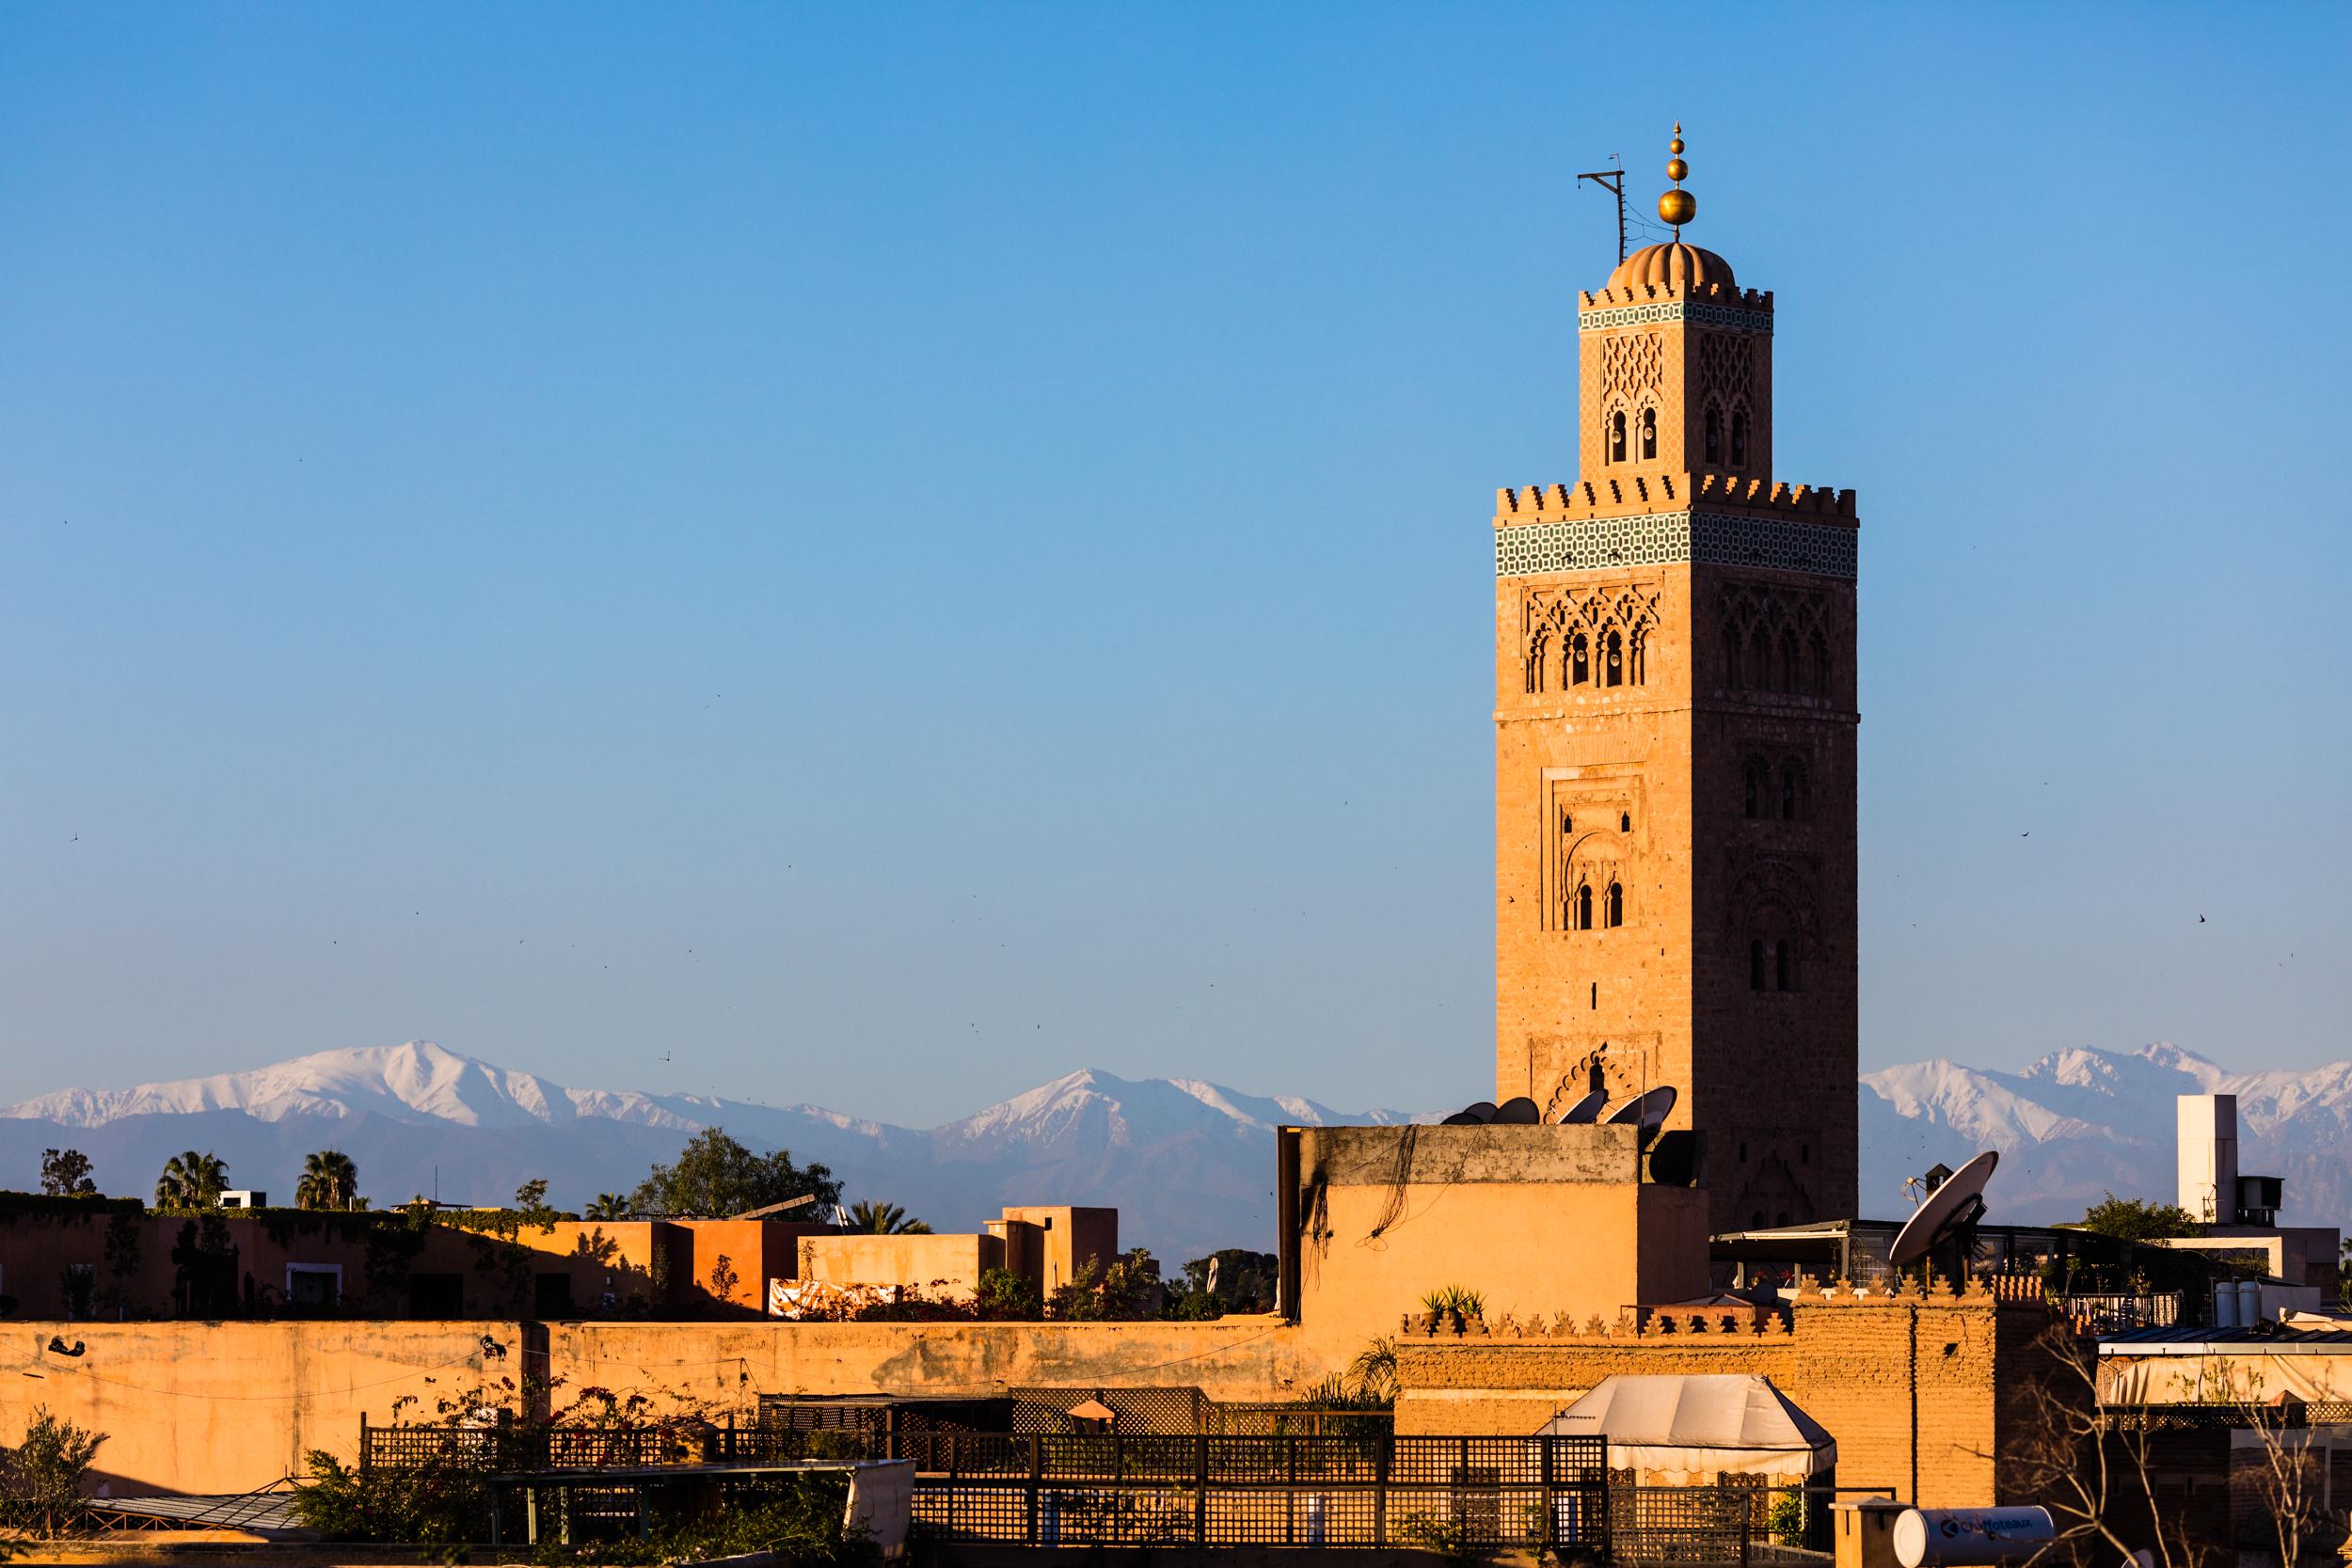 Colin_Herrington_Maroc_Stories-25.jpg